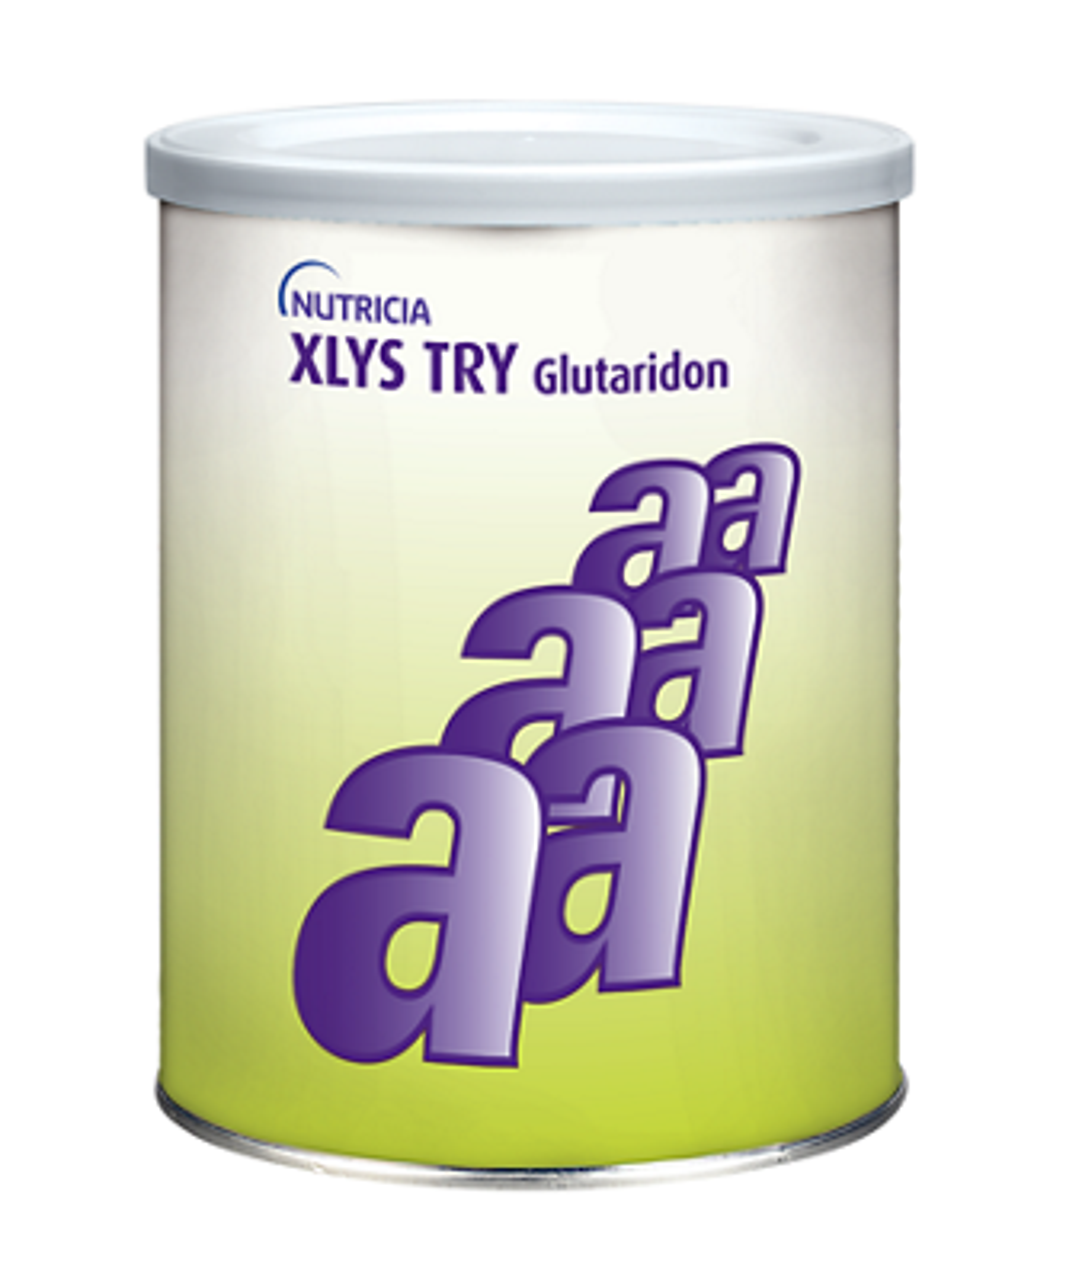 metabolics-xlys-tyr-glutaridon-tin-packshot.png